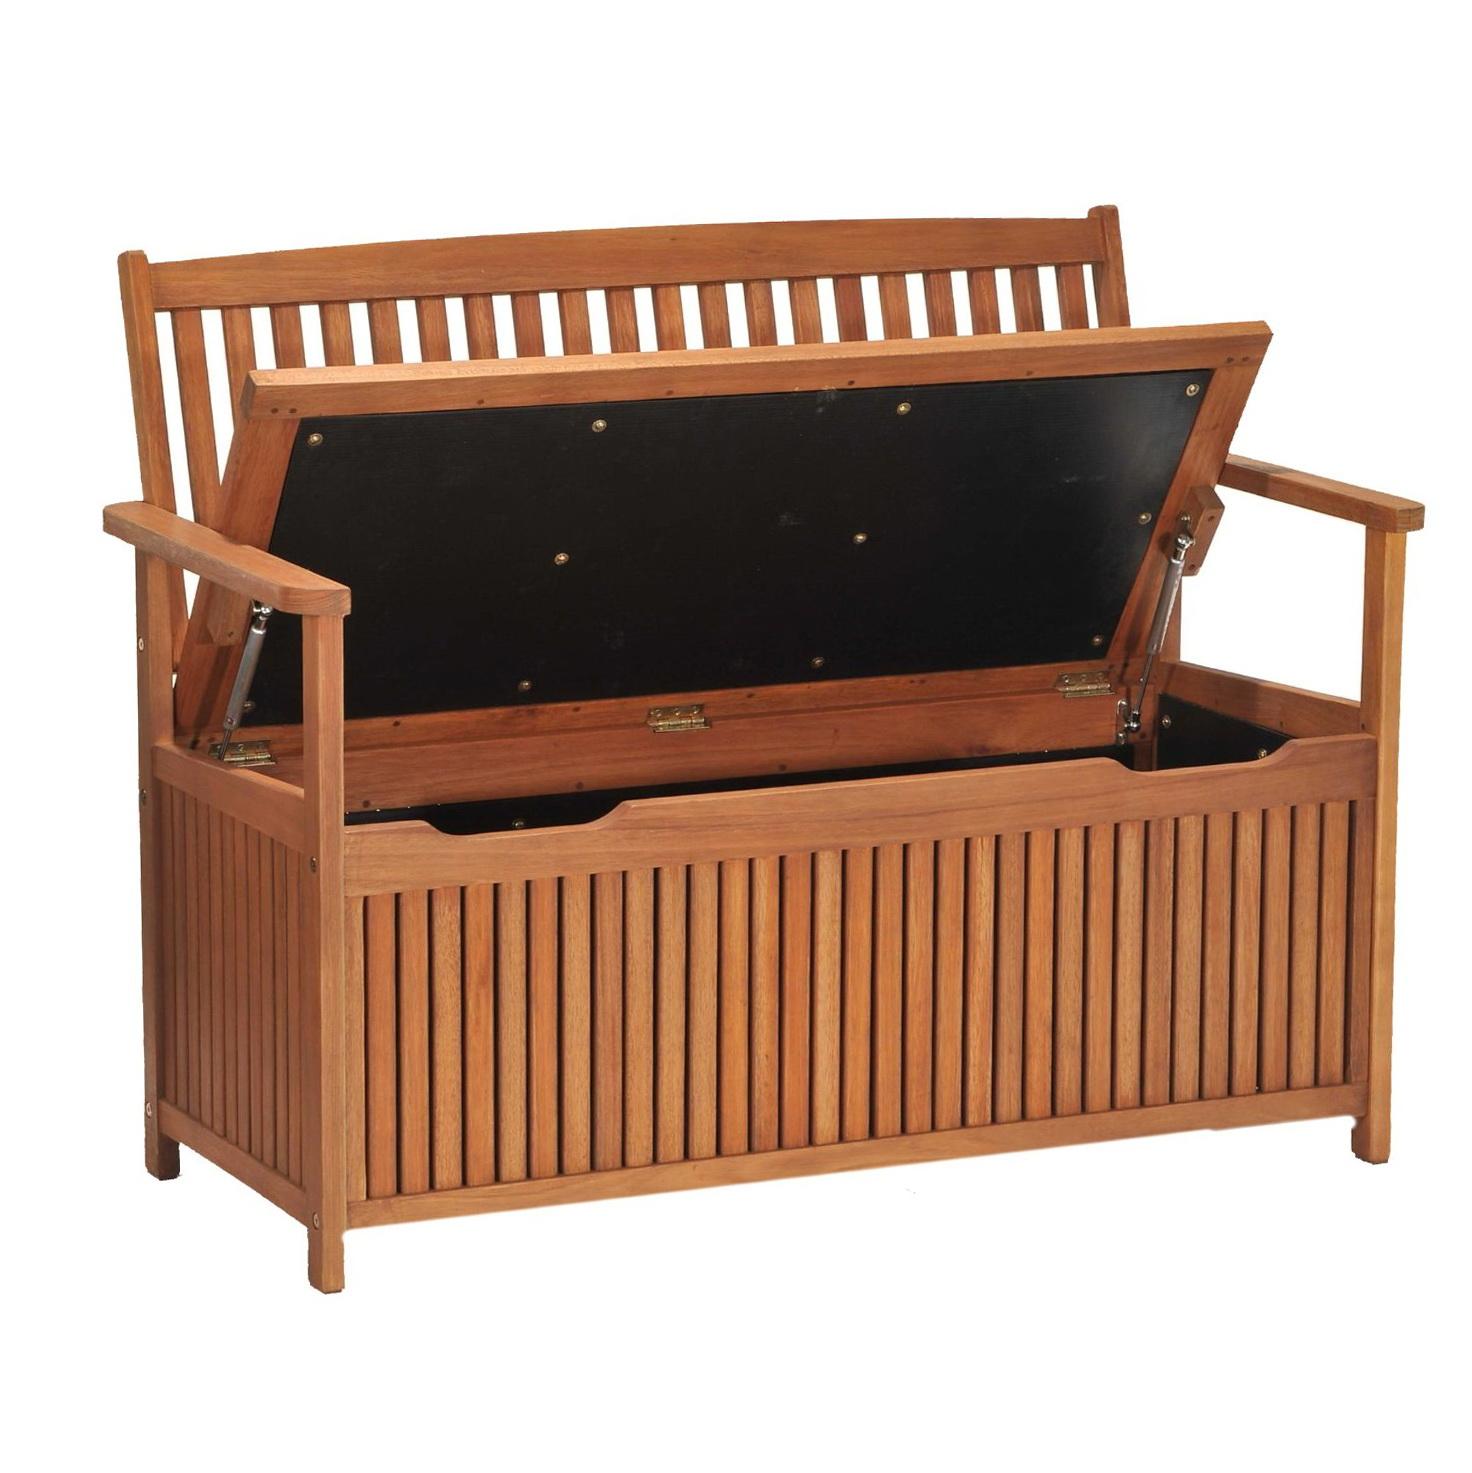 Outdoor Wood Storage Bench